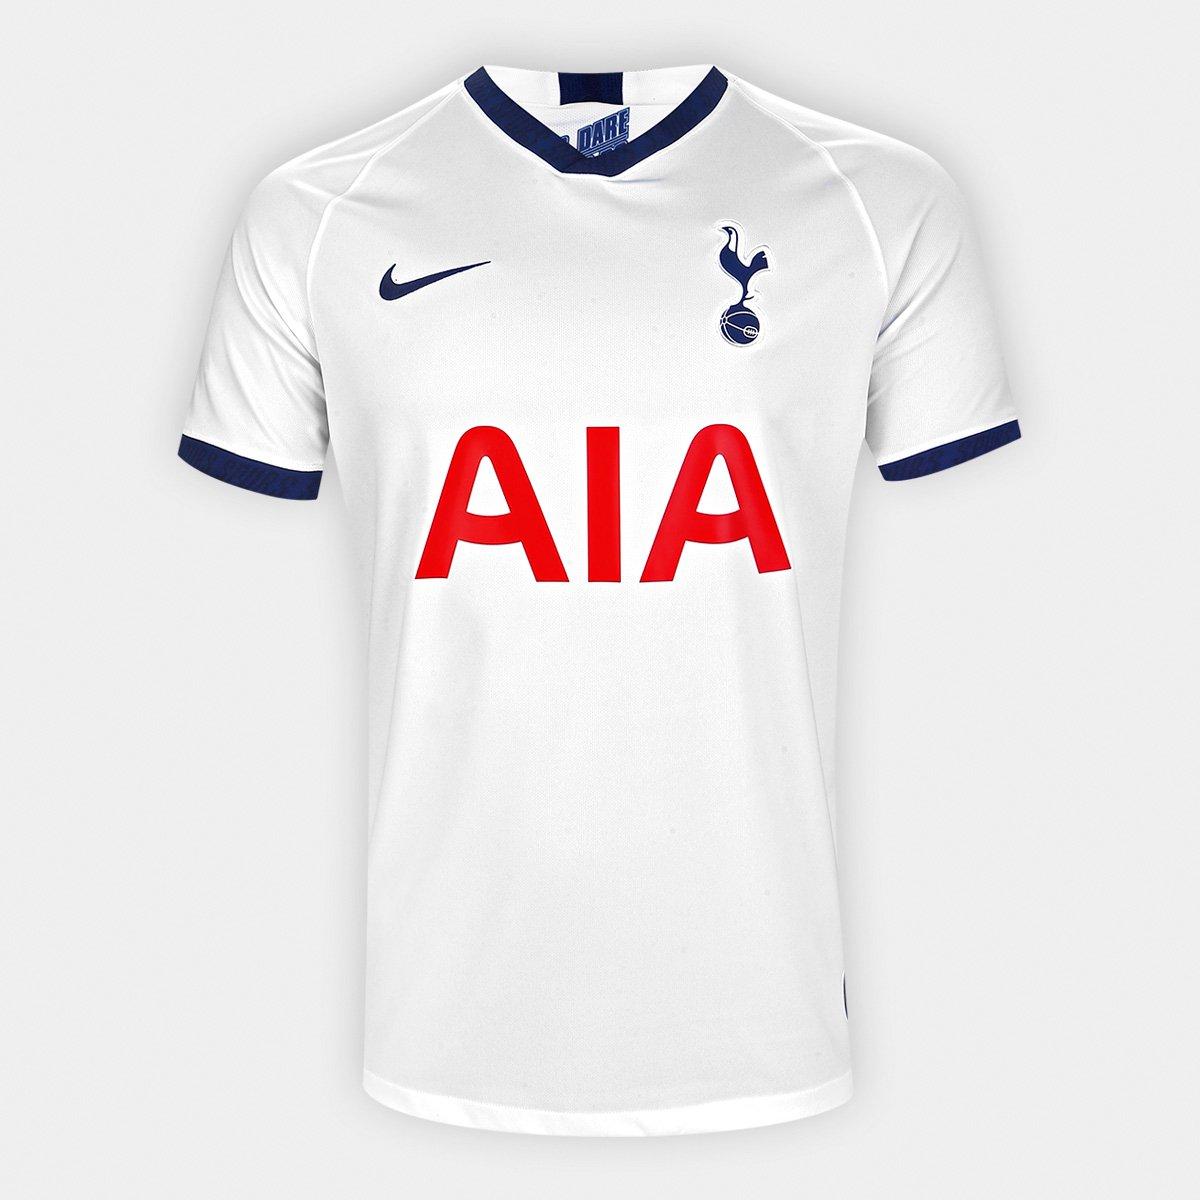 7fc28cc37a Camisa Tottenham Home 19/20 s/nº Torcedor Nike Masculina | Netshoes